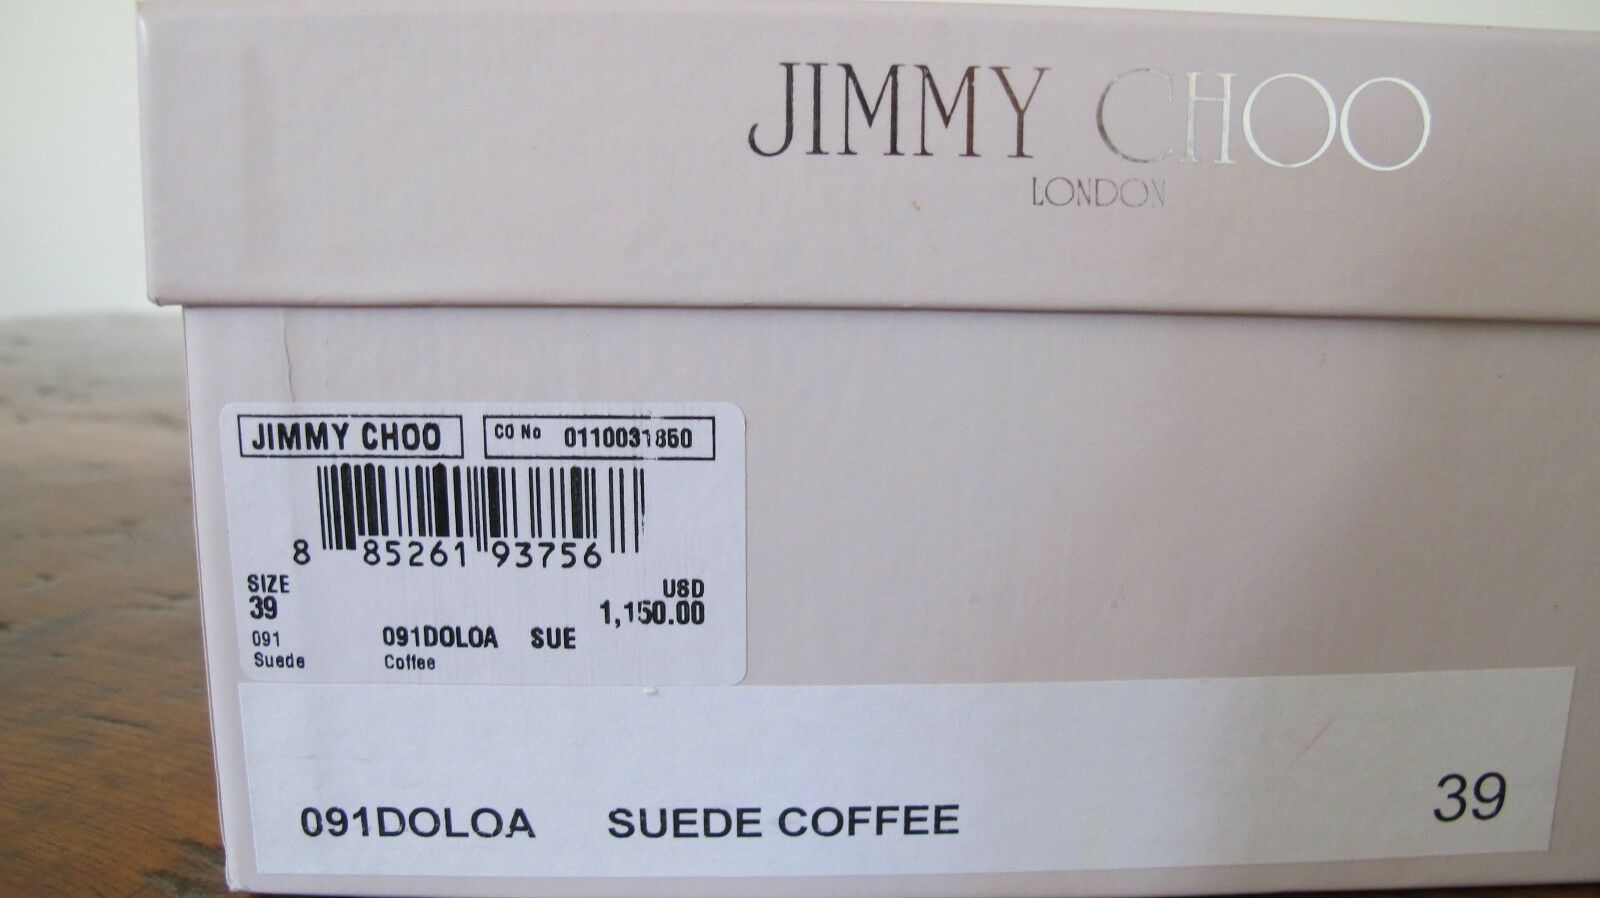 JIMMY CHOO SUEDE BEADED SHELL EMBELLISHED BROWN SUEDE CHOO GLADIATOR DOLOA SANDAL 39 9 e5fc34